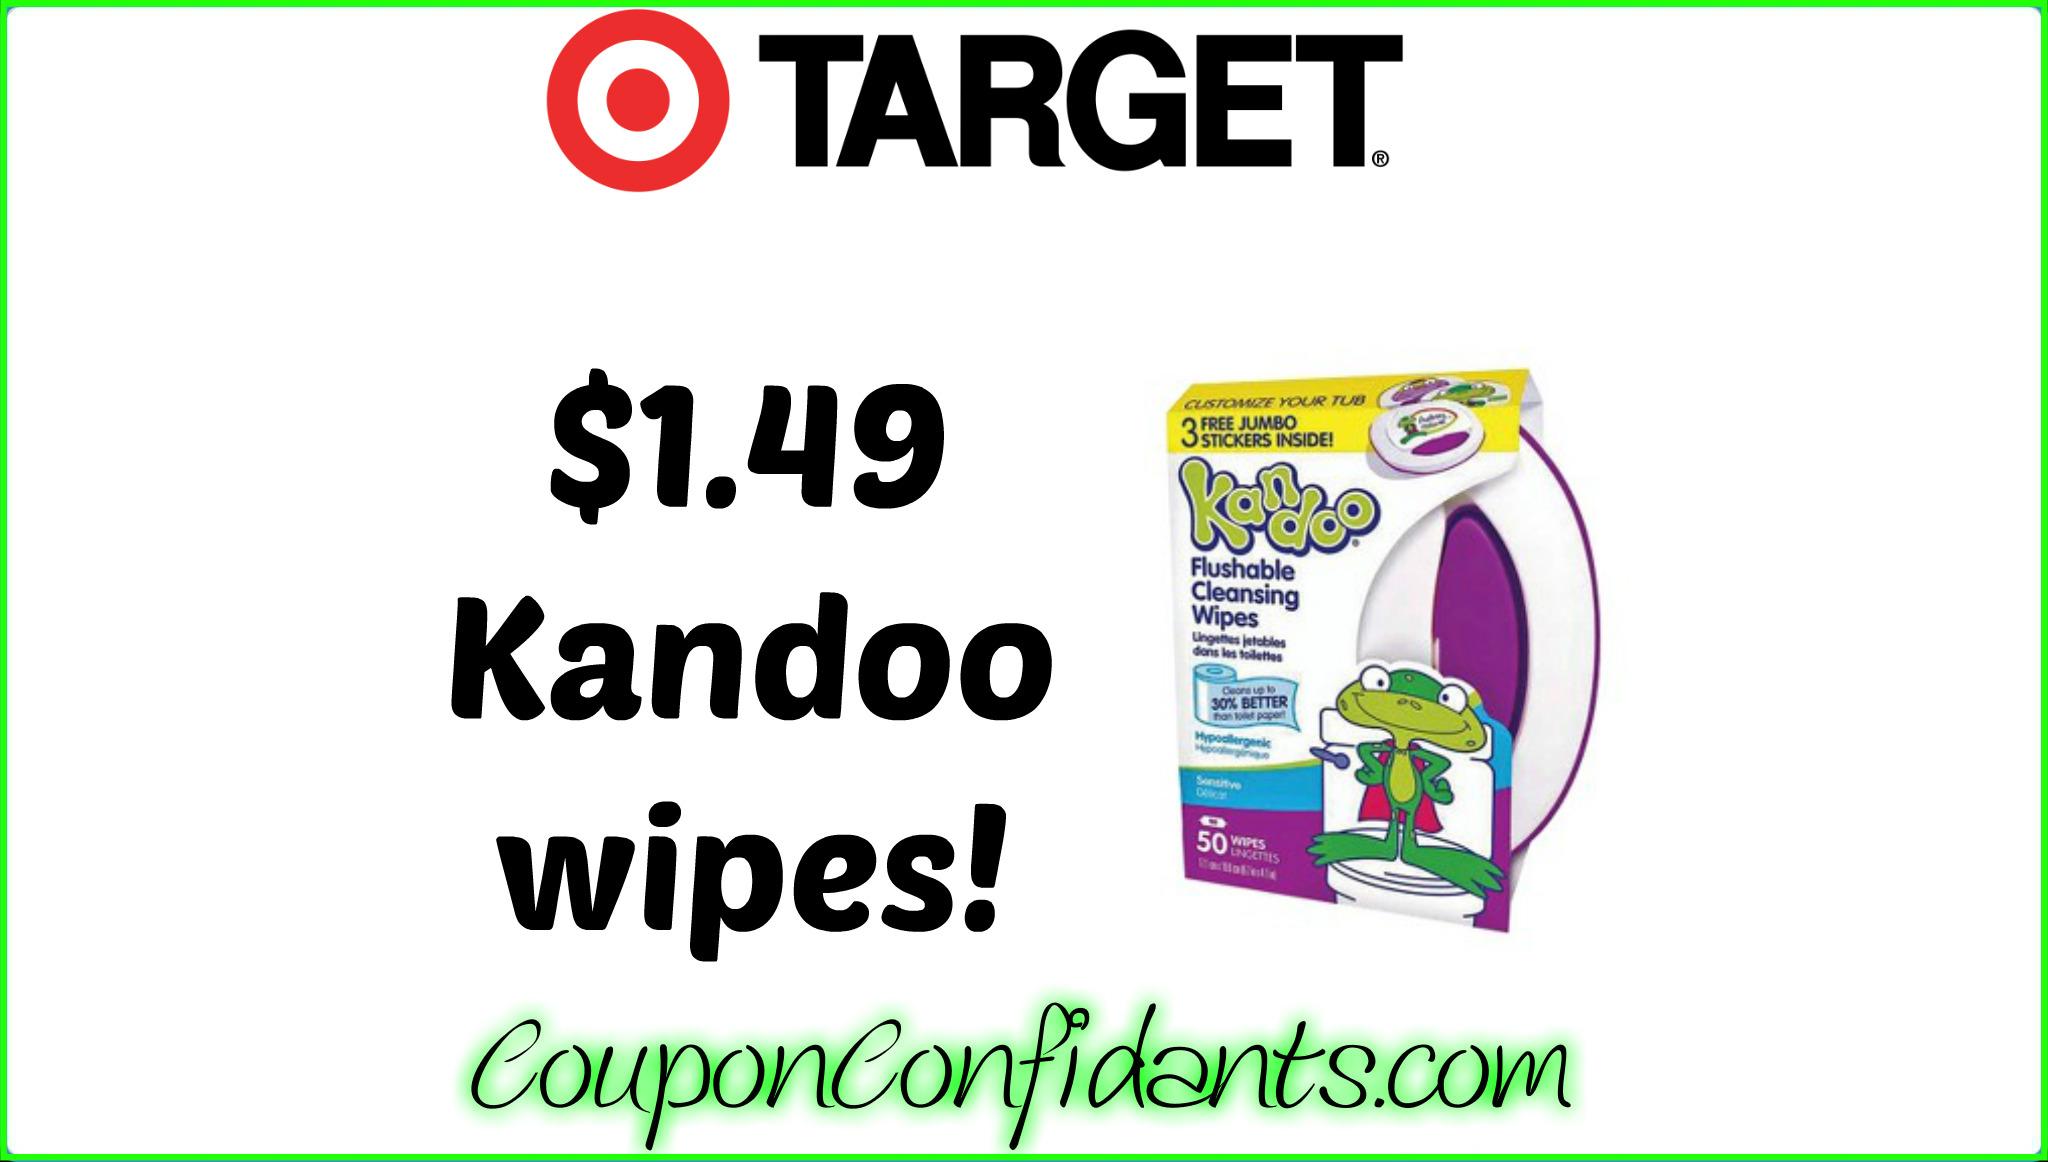 Kandoo Wipes only $1.49 at Target!